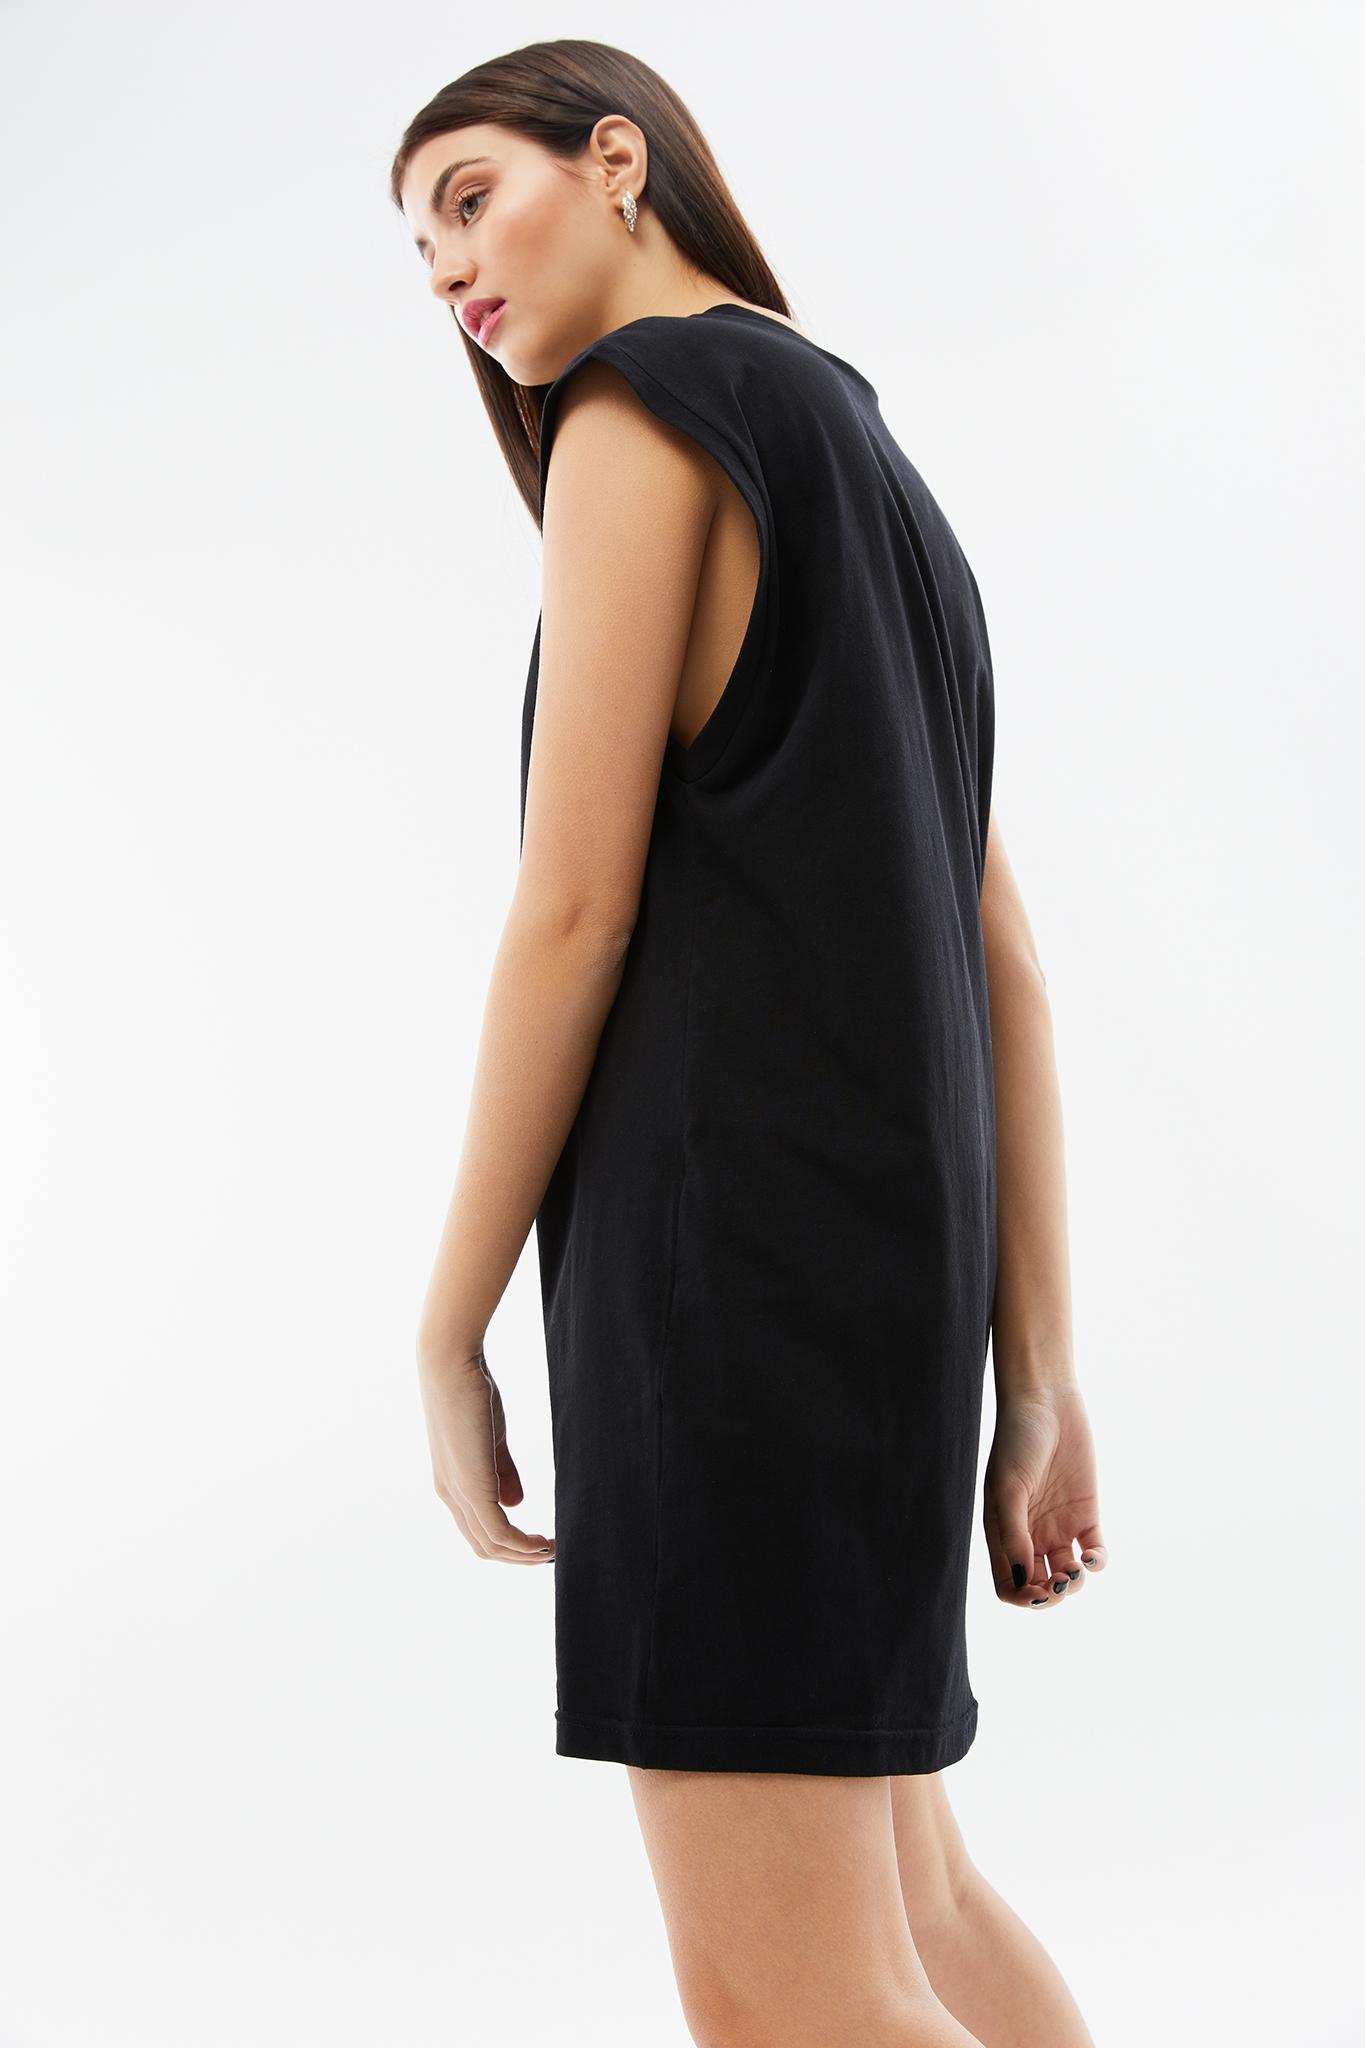 BLAMEYOURDAZE SLEEVELESS MINI COTTON BLACK DRESS